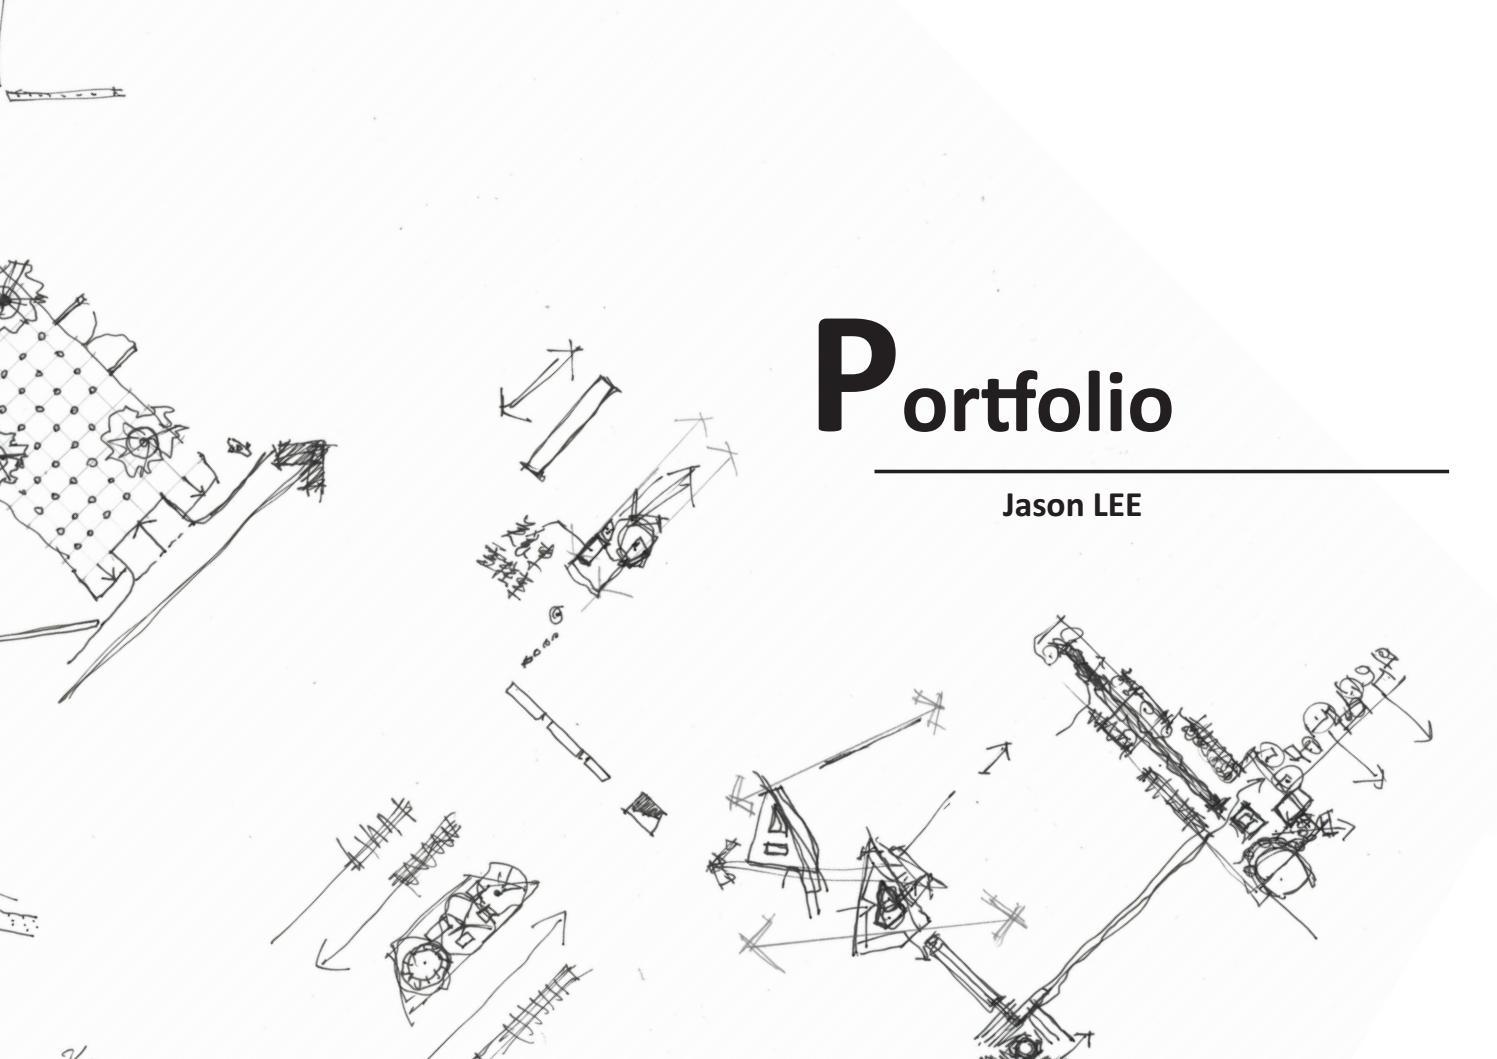 Portfolio 2019 By Jason LEE